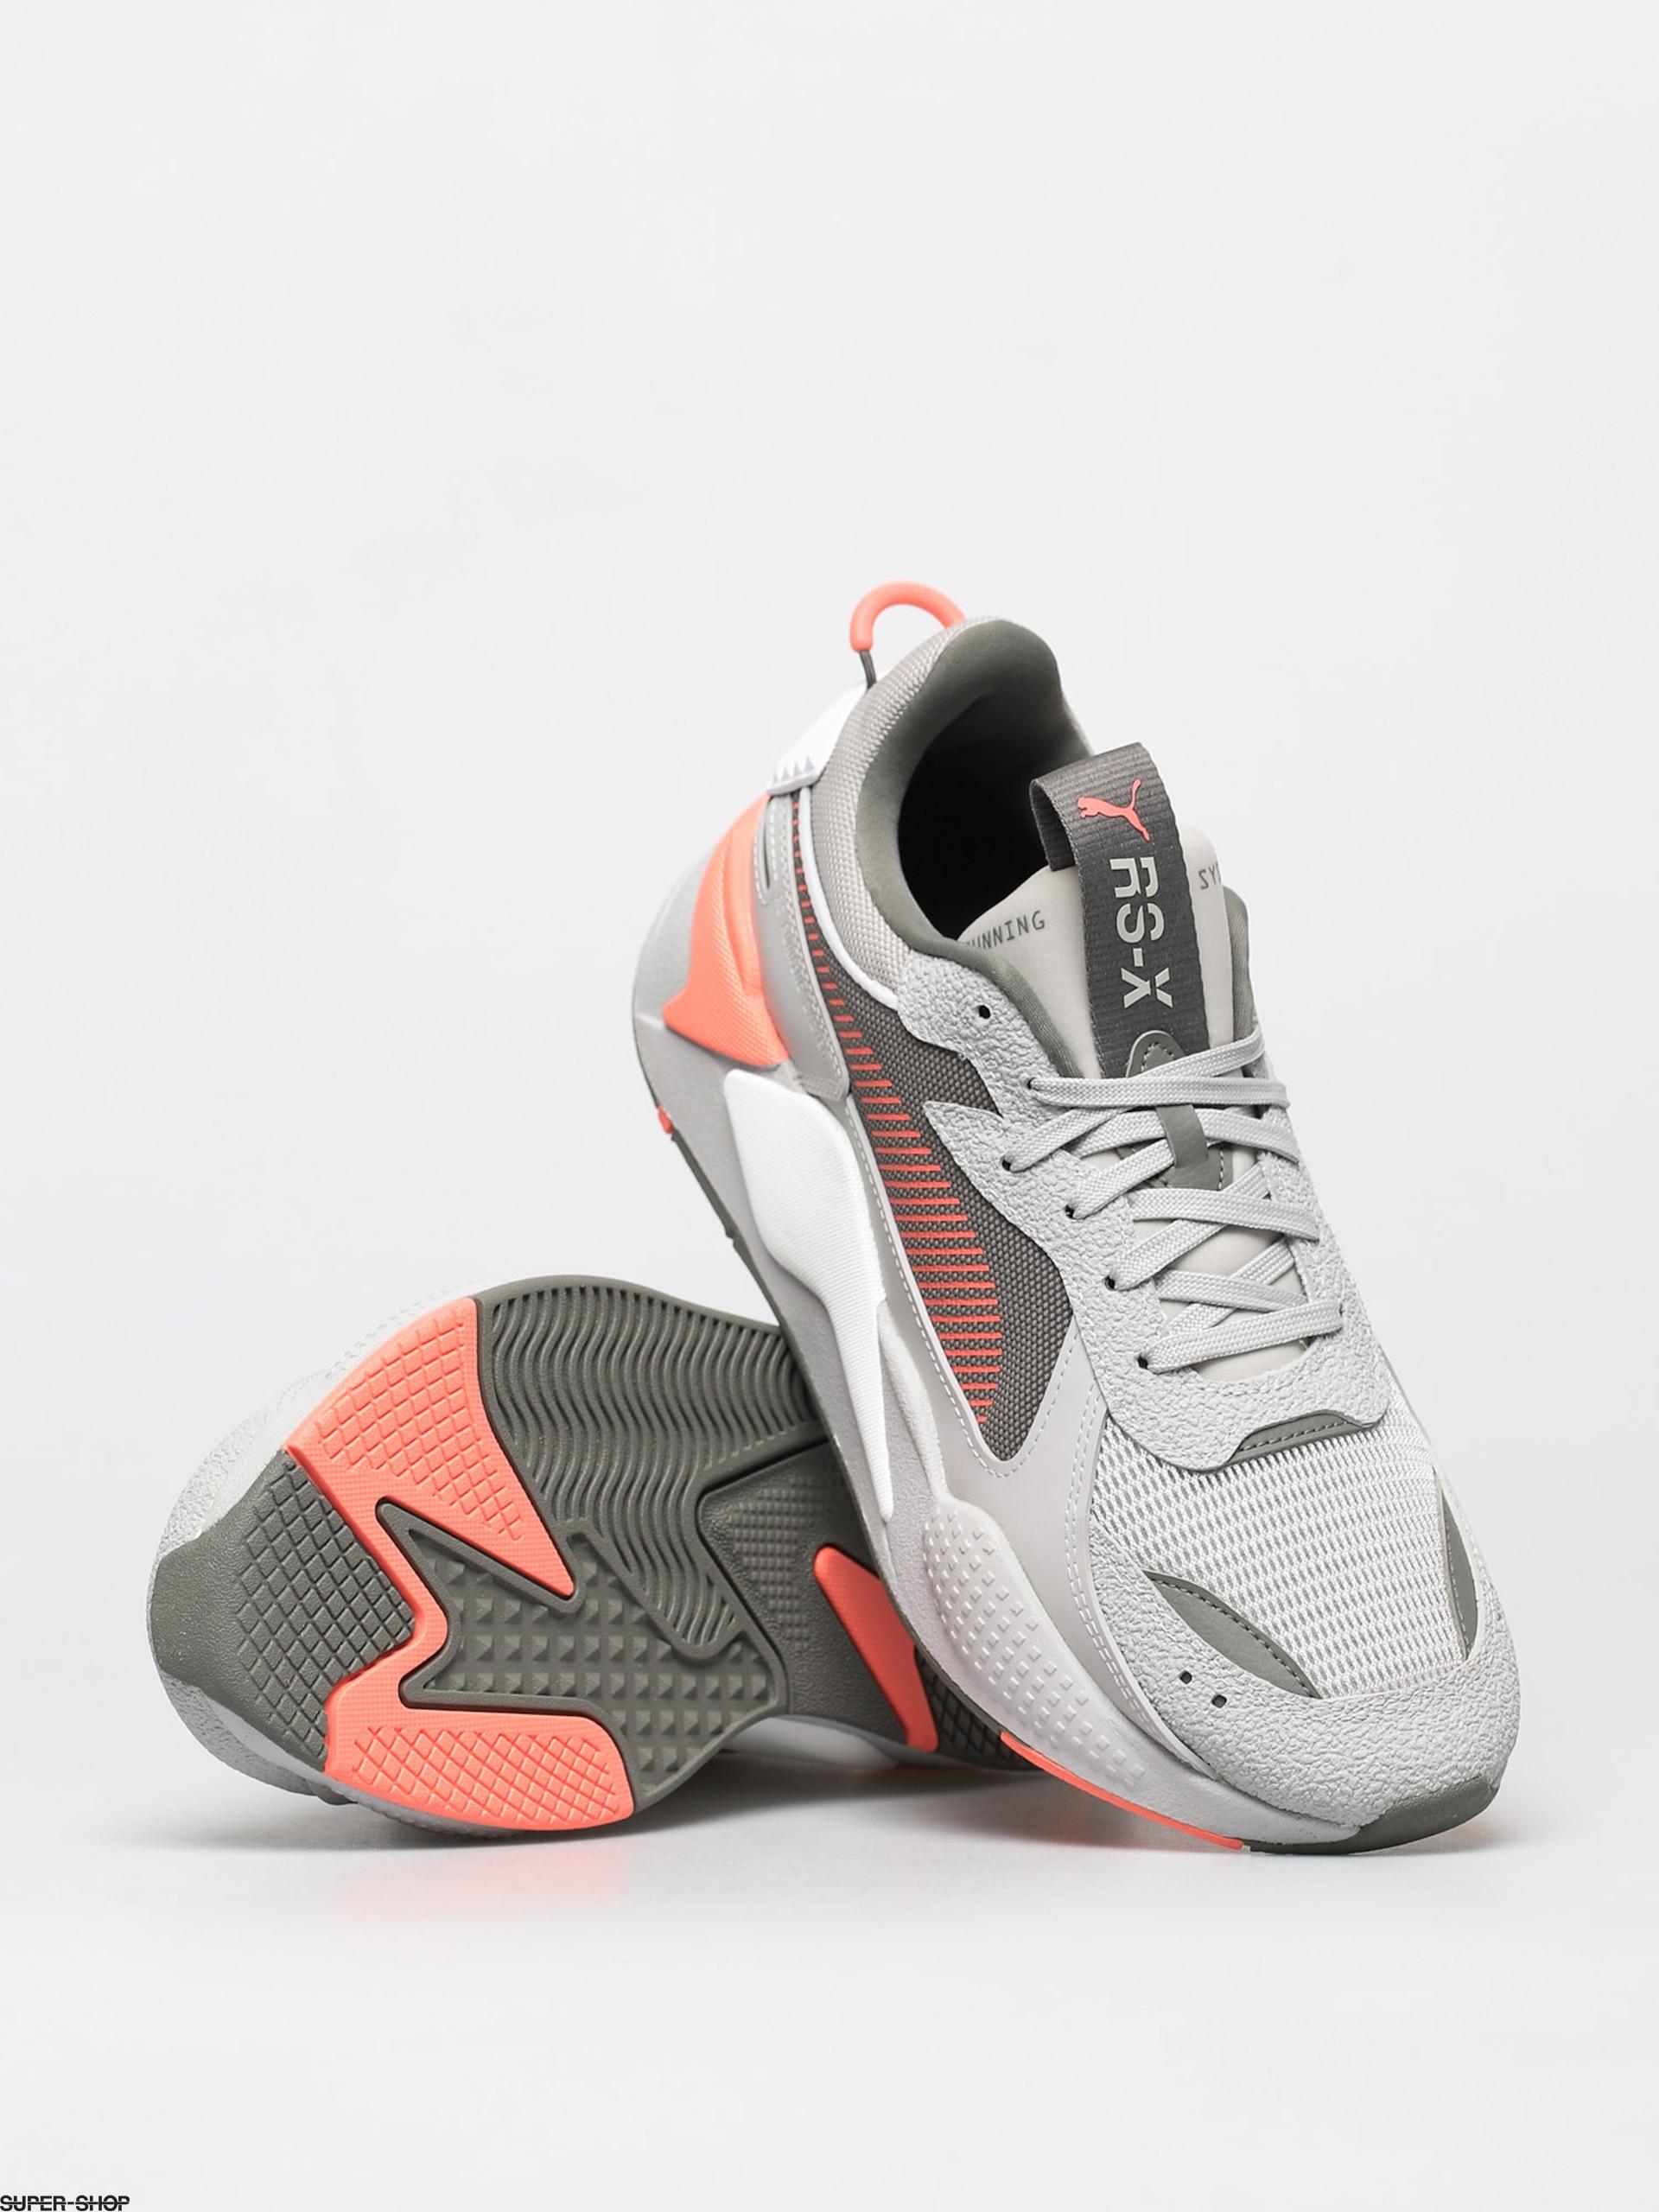 Puma Rs X Hard Drive Shoes (gray violet